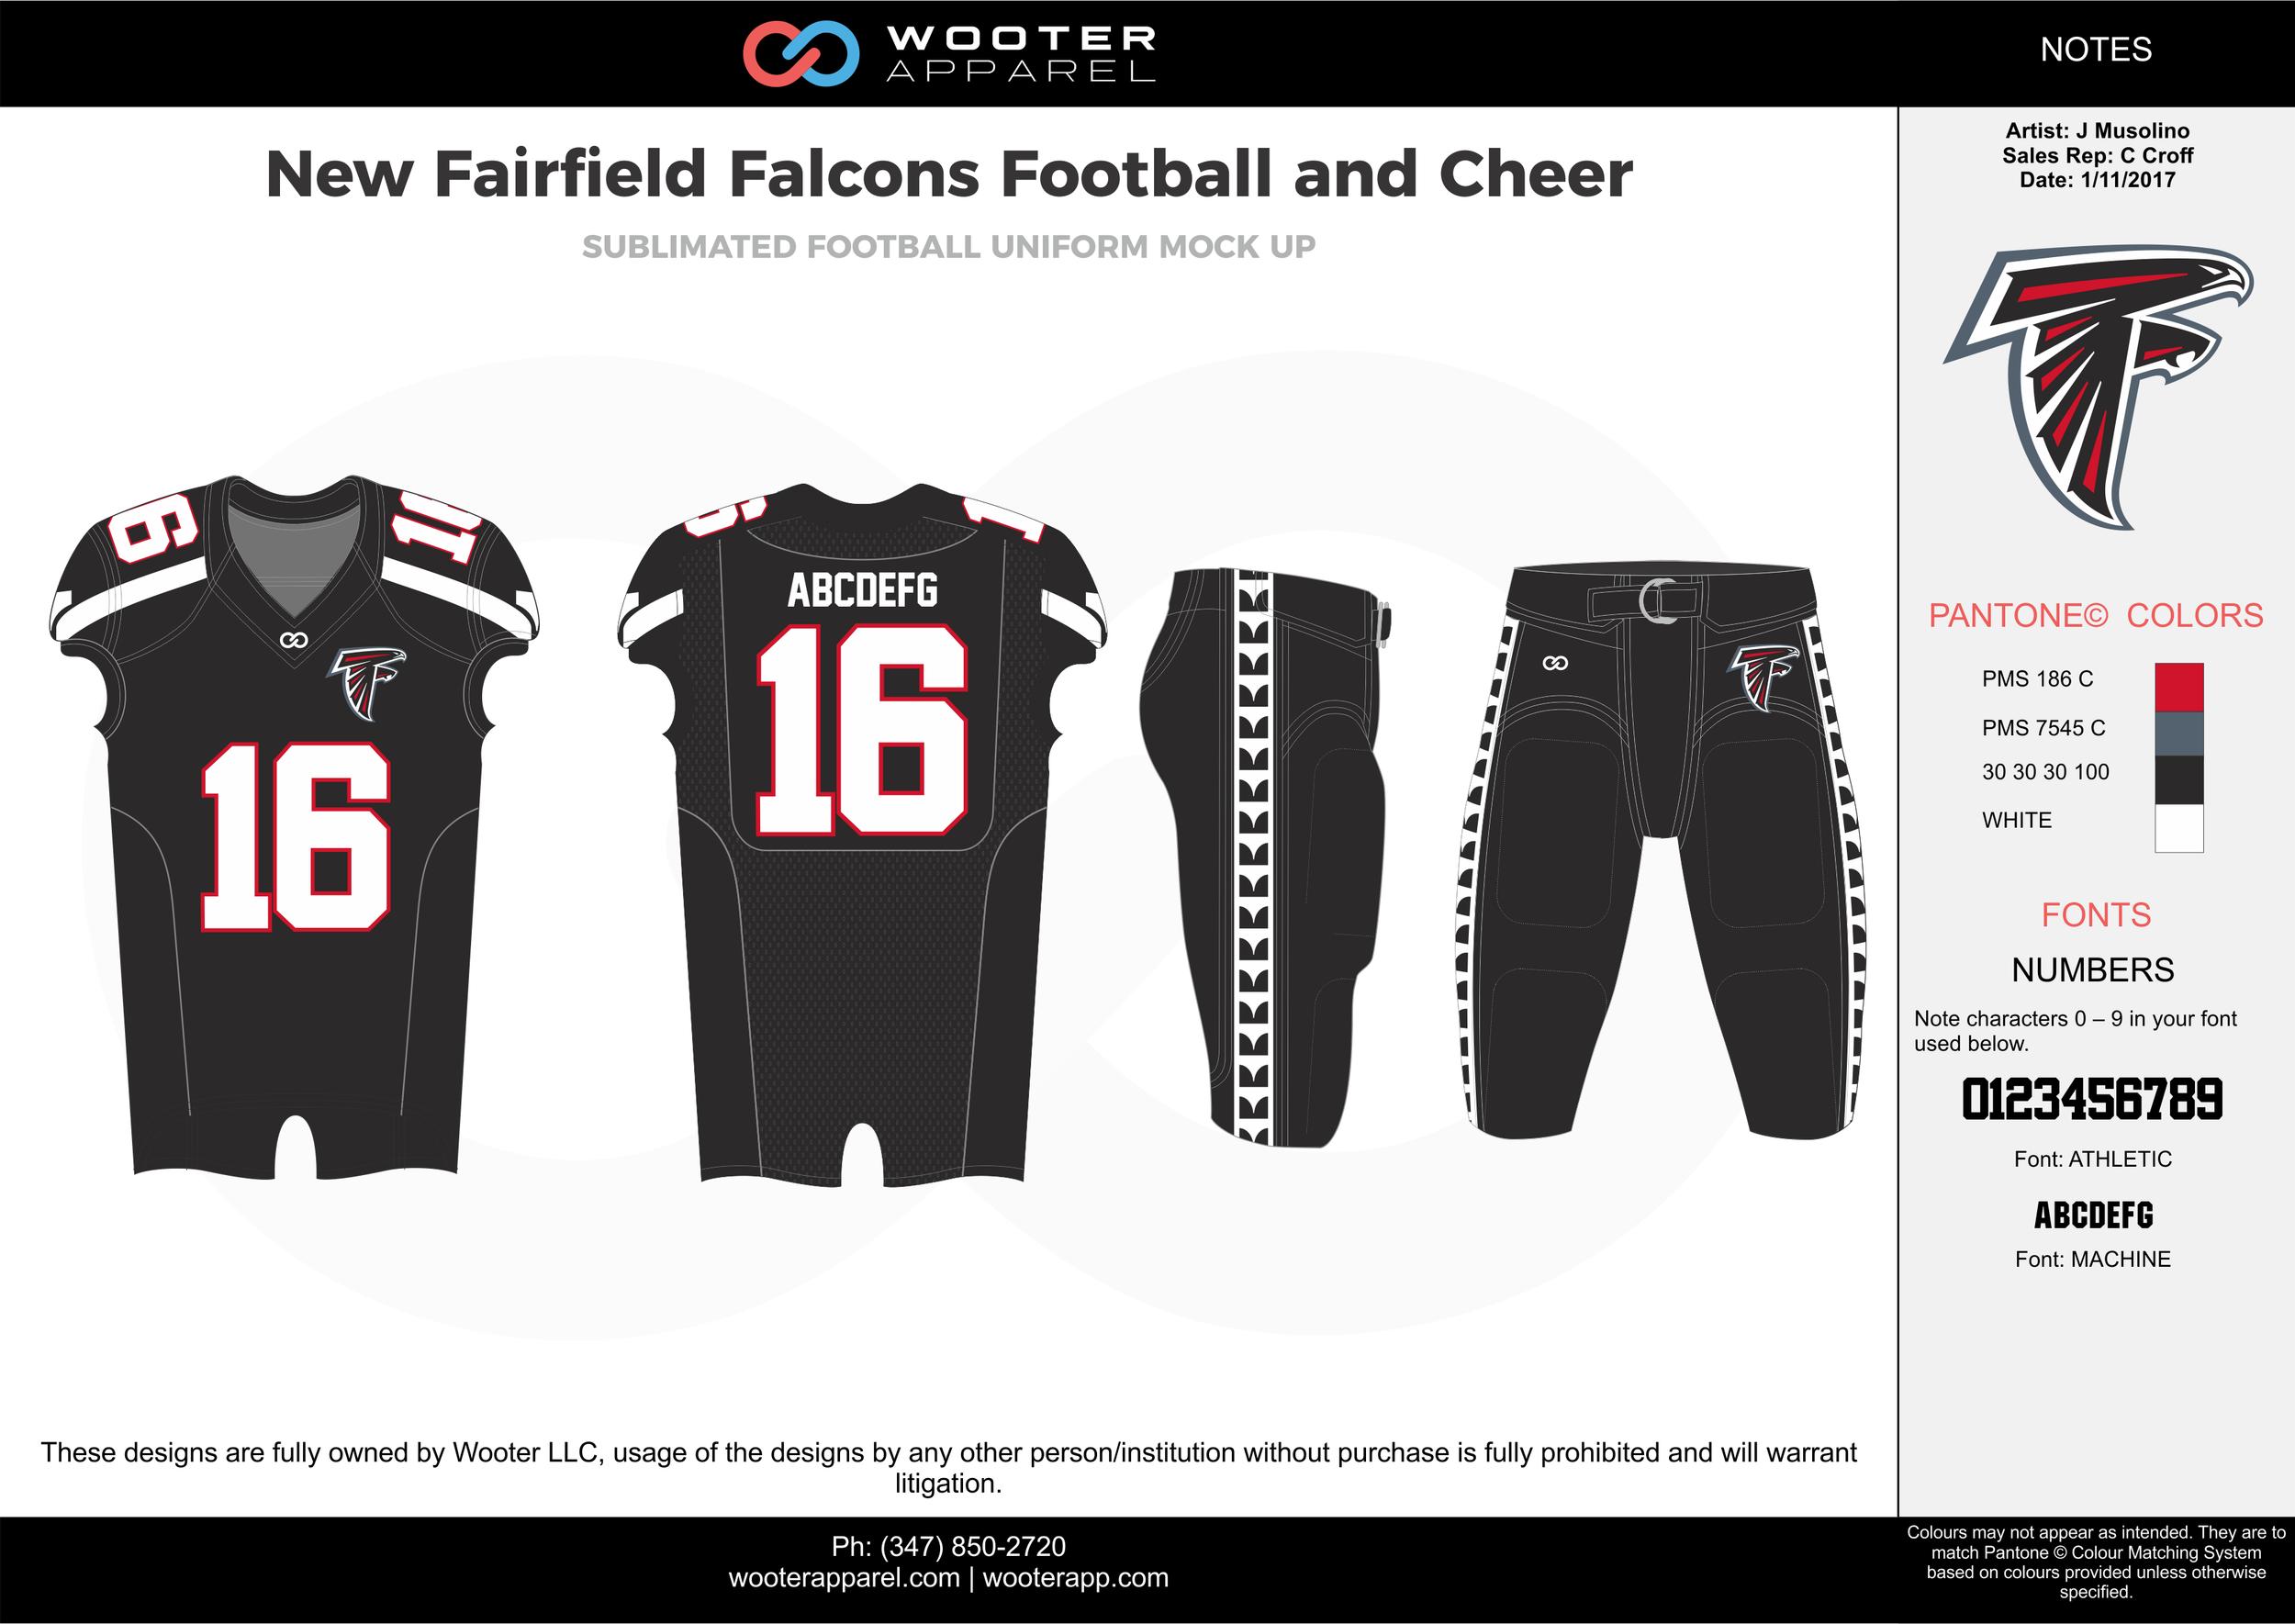 New Fairfield Falcons black gray red white football uniforms jerseys pants